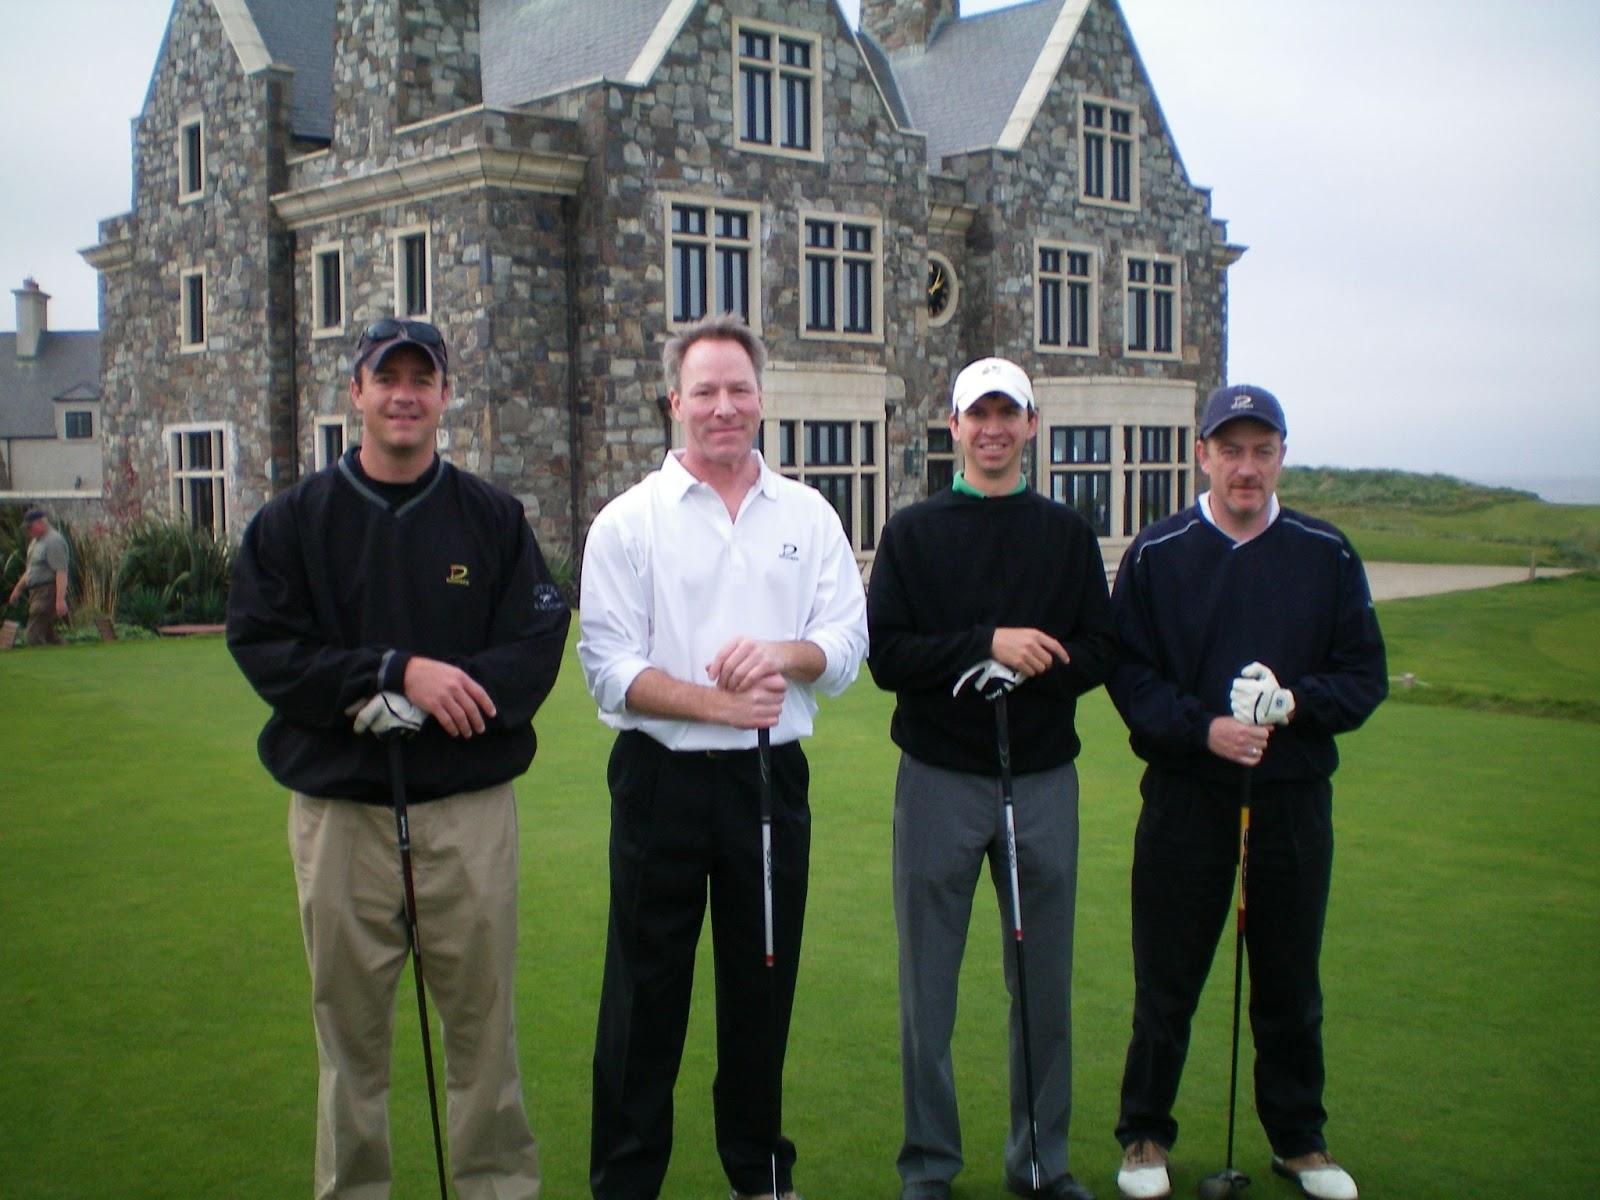 Photo of Morgan Eldridge and three friends posing with golf clubs in golf attire